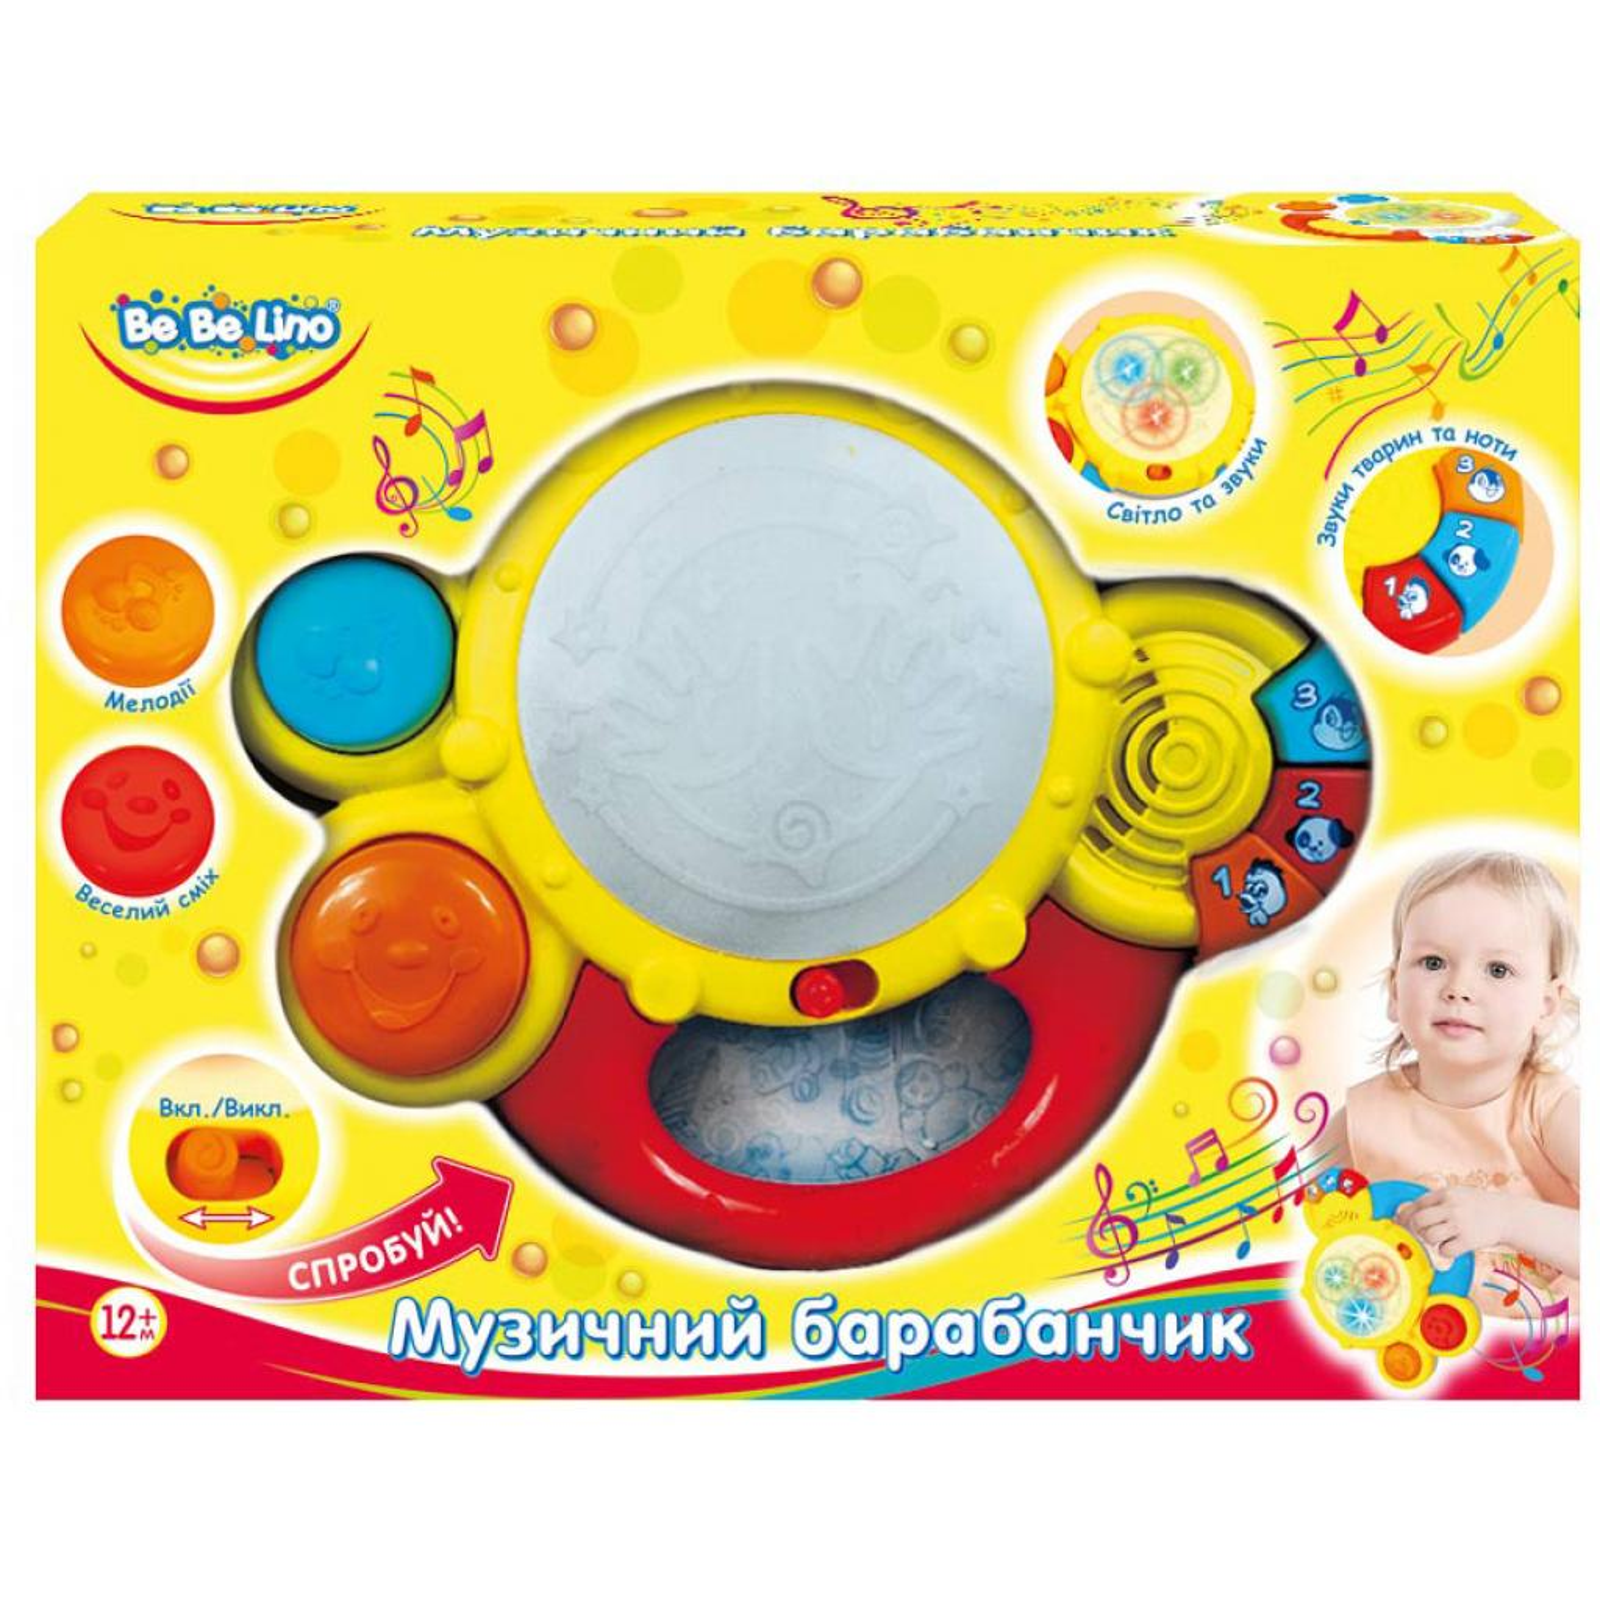 Музыкальная игрушка BeBeLino Музыкальный барабанчик бело-желтый (57067-2)